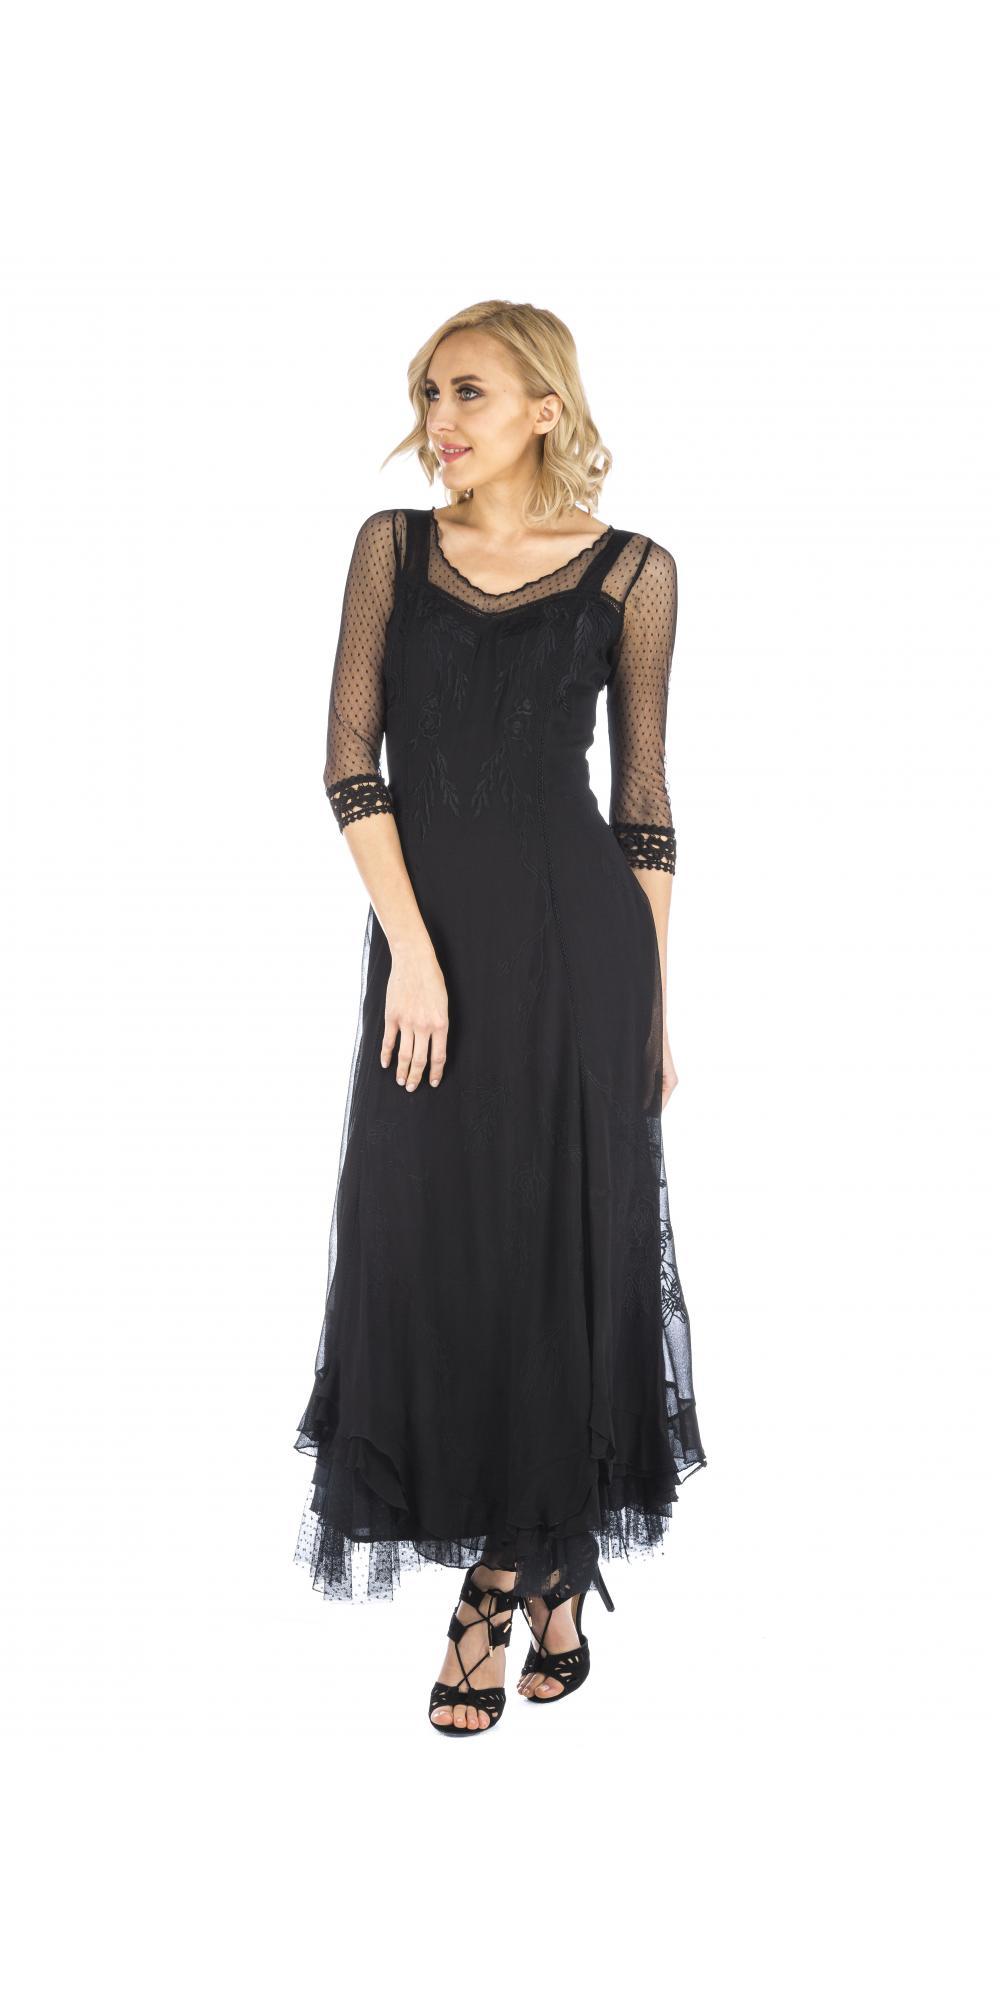 Black Style Wedding Dress